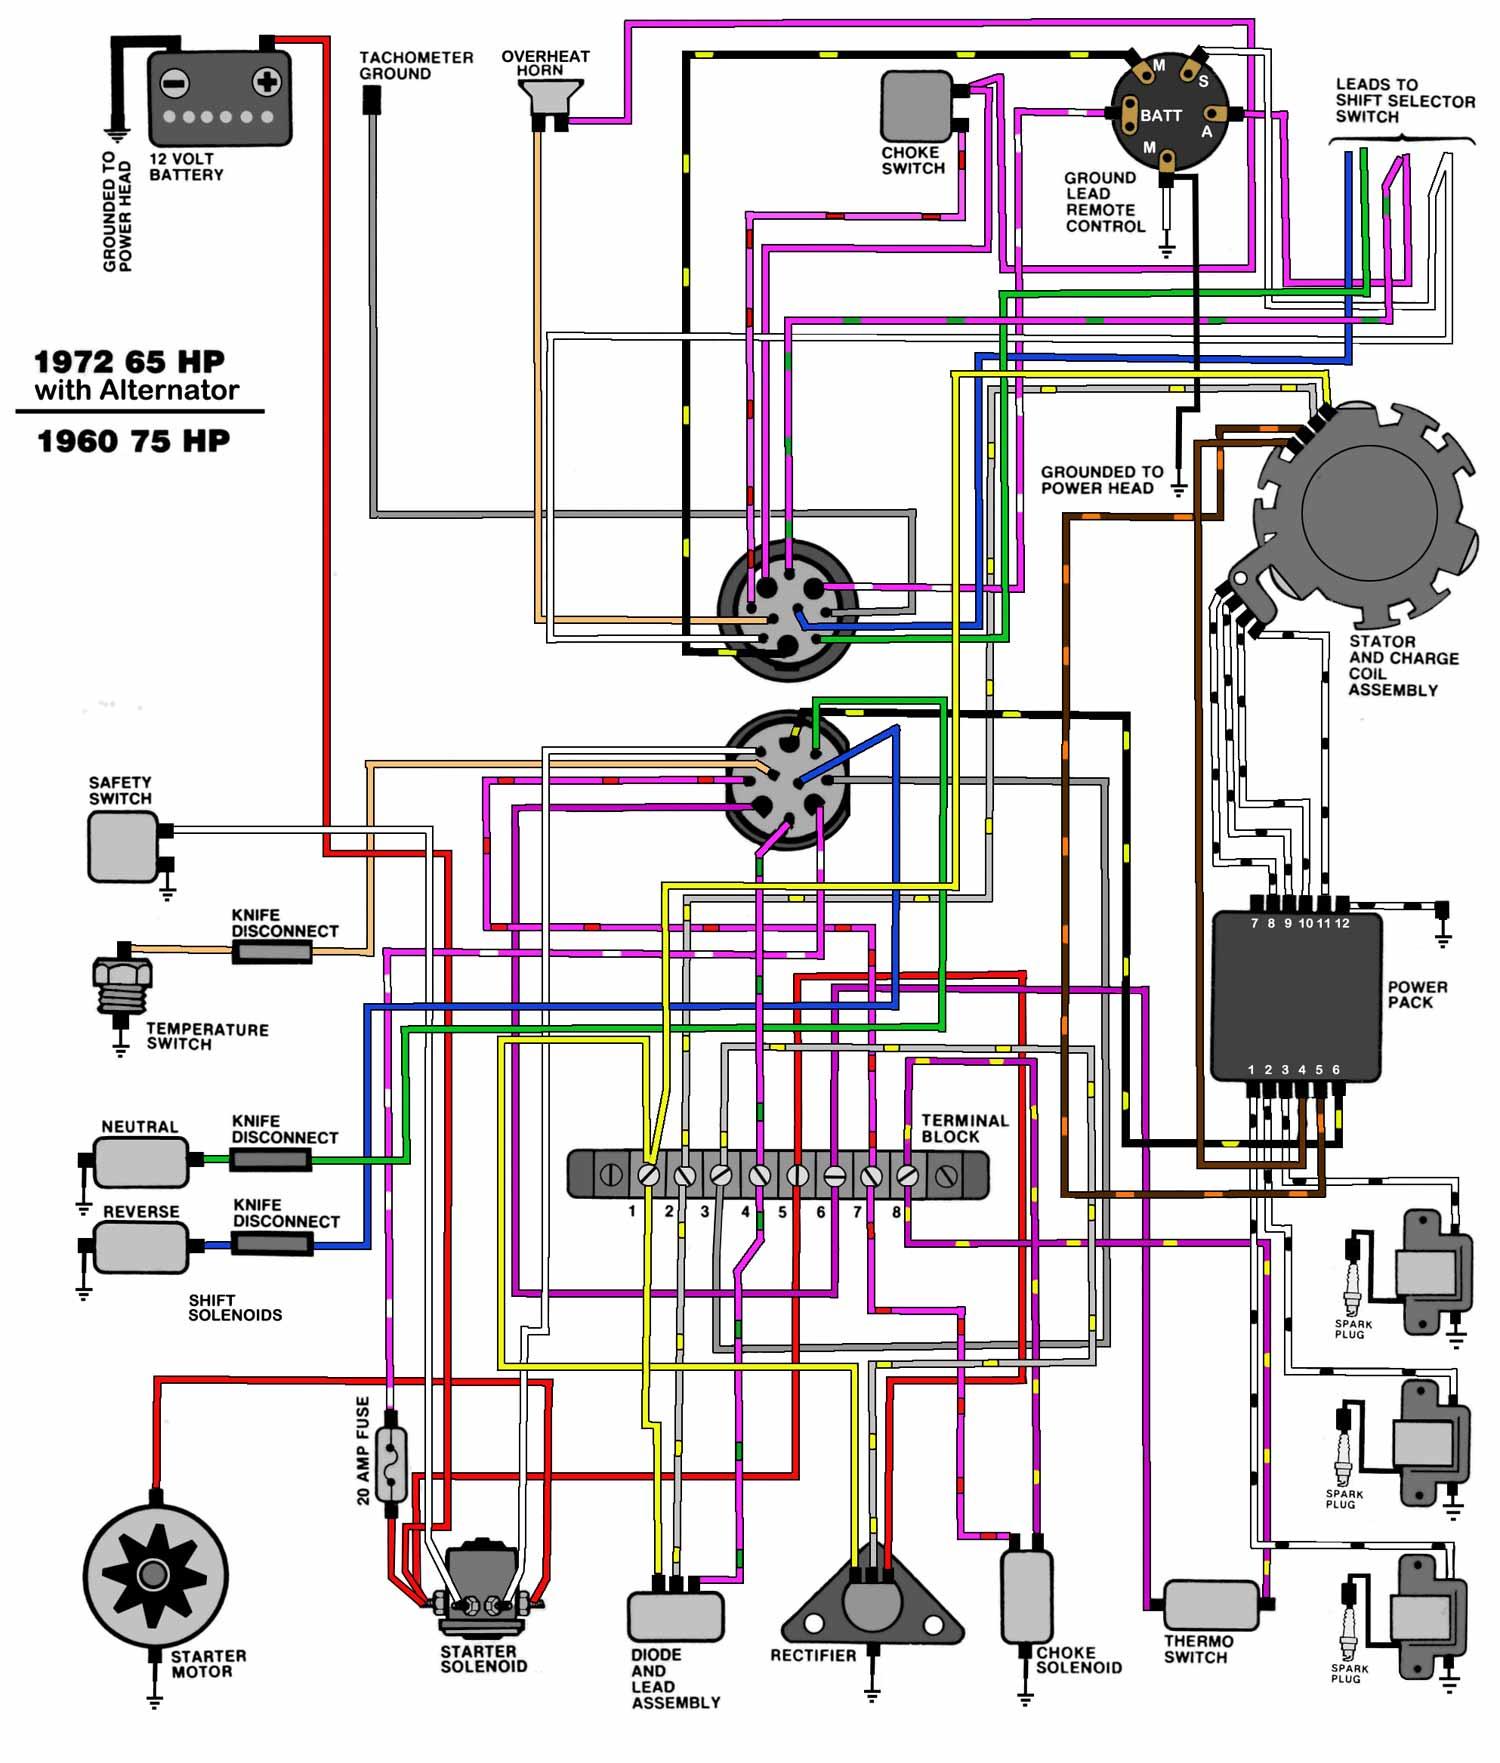 100hp Mercury Mariner Wire Diagram Evinrude Johnson Outboard Wiring Diagrams Mastertech